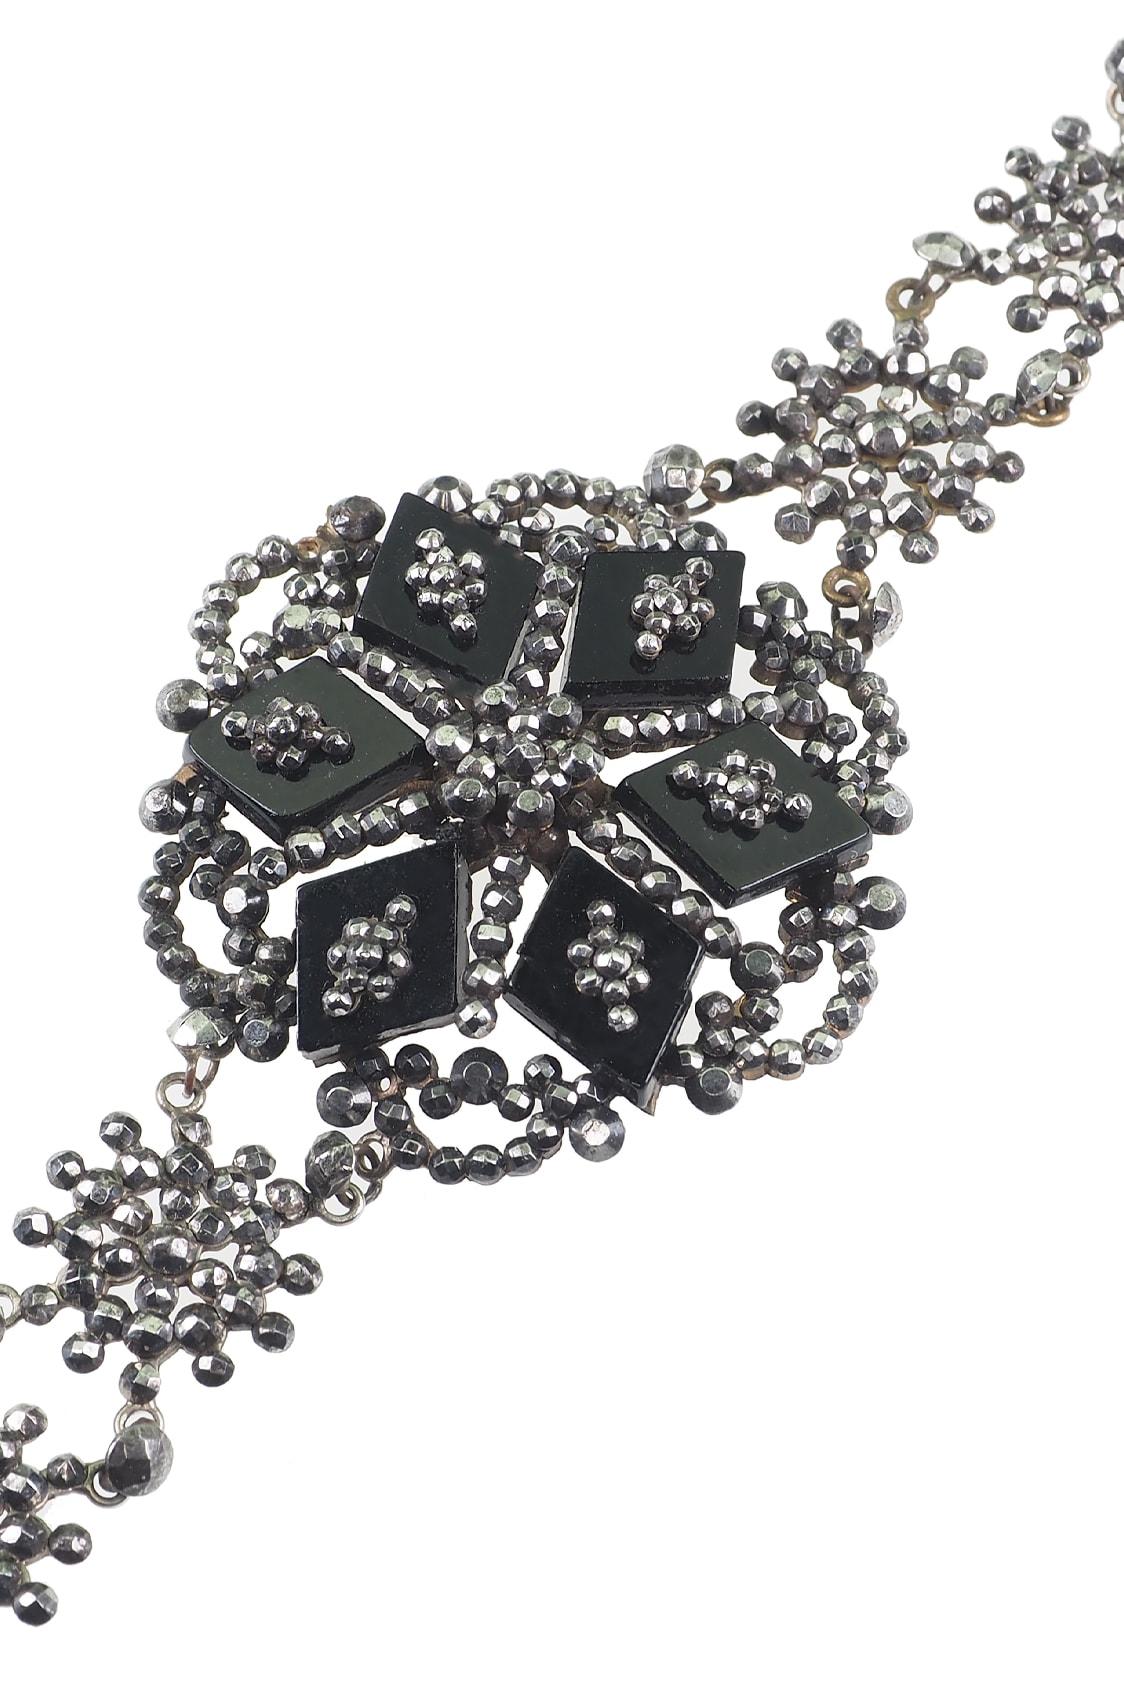 antikschmuck-armband-1120-1